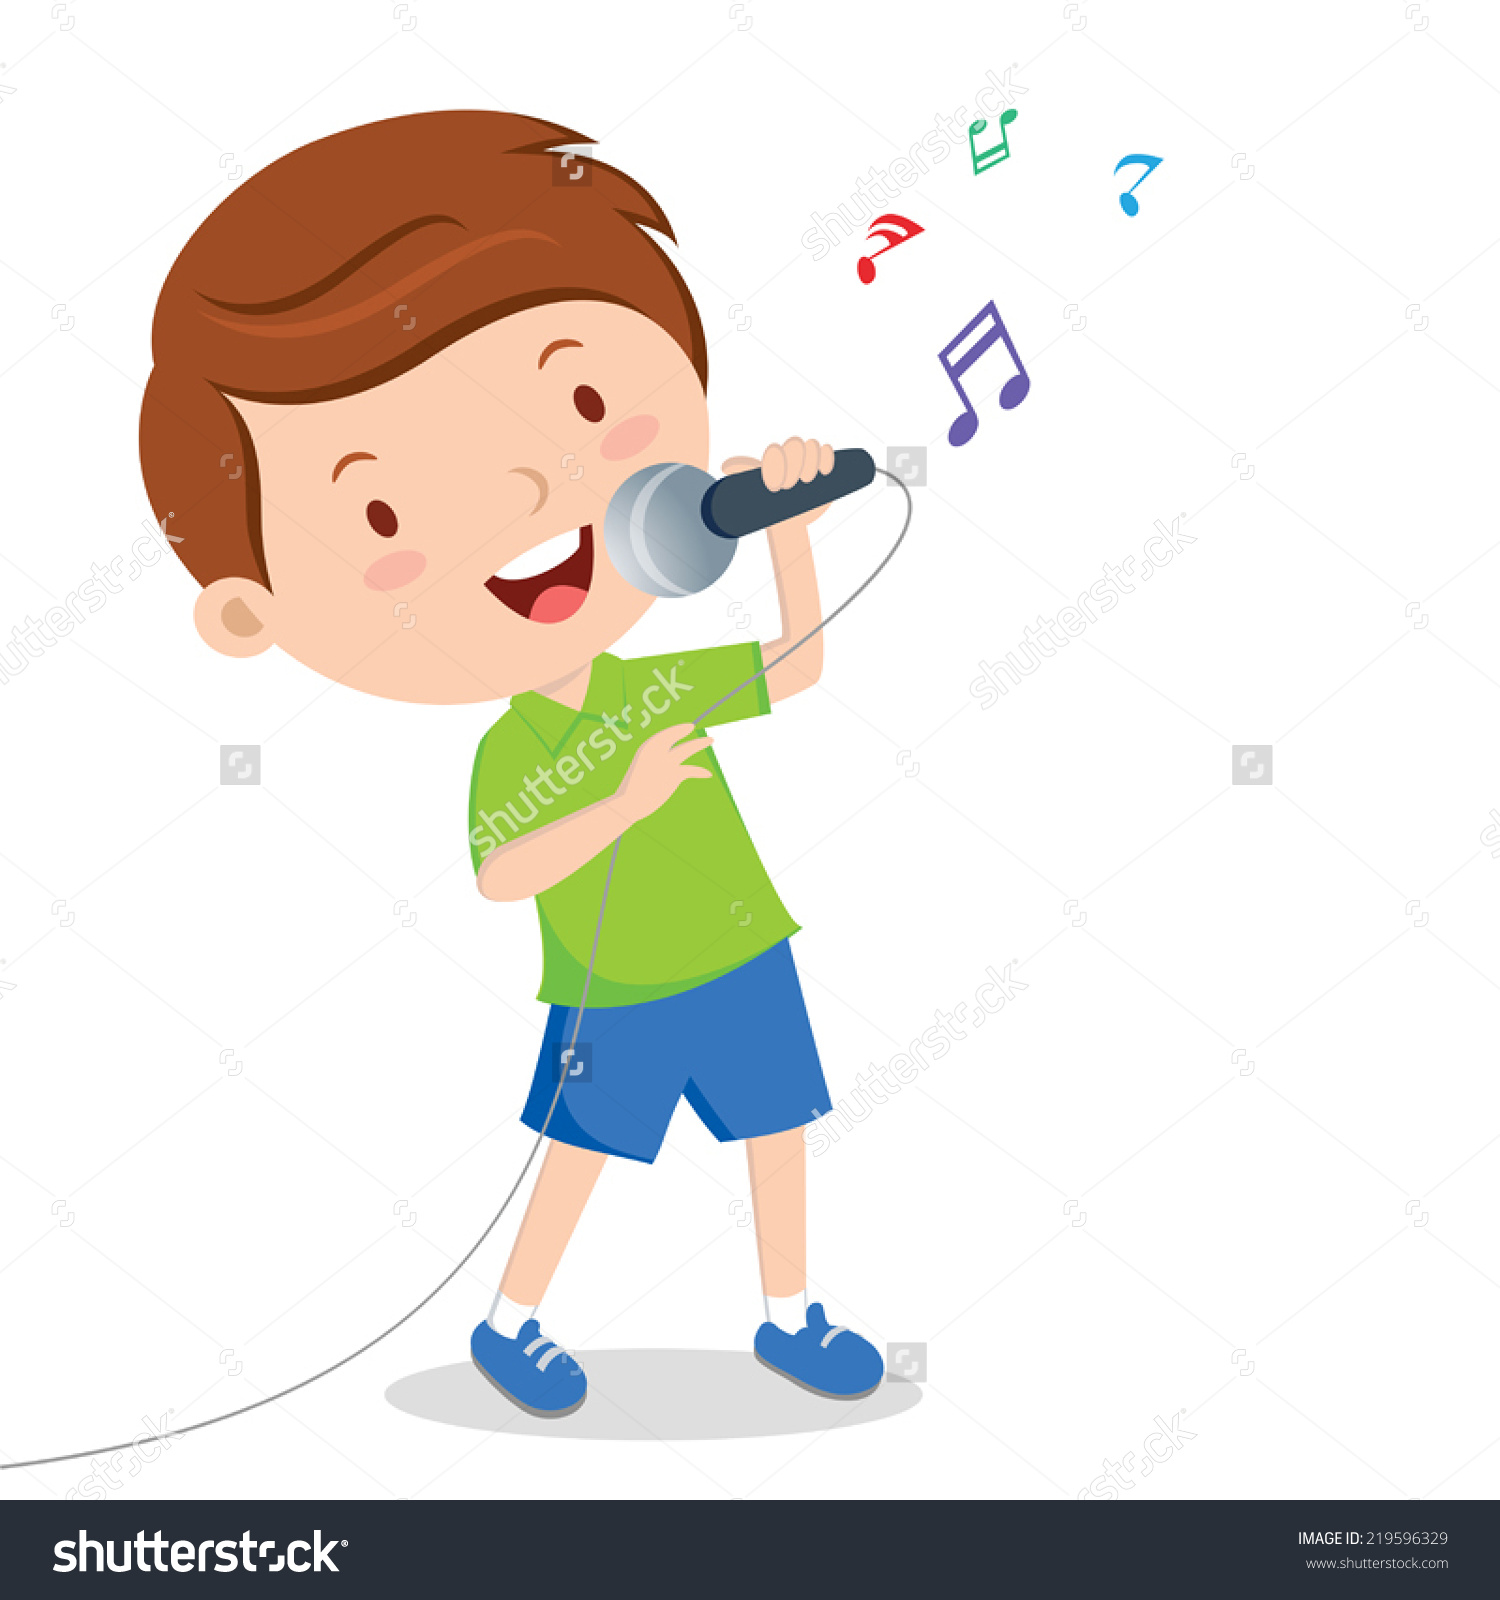 Little Boy Singing With .-Little Boy Singing With .-13